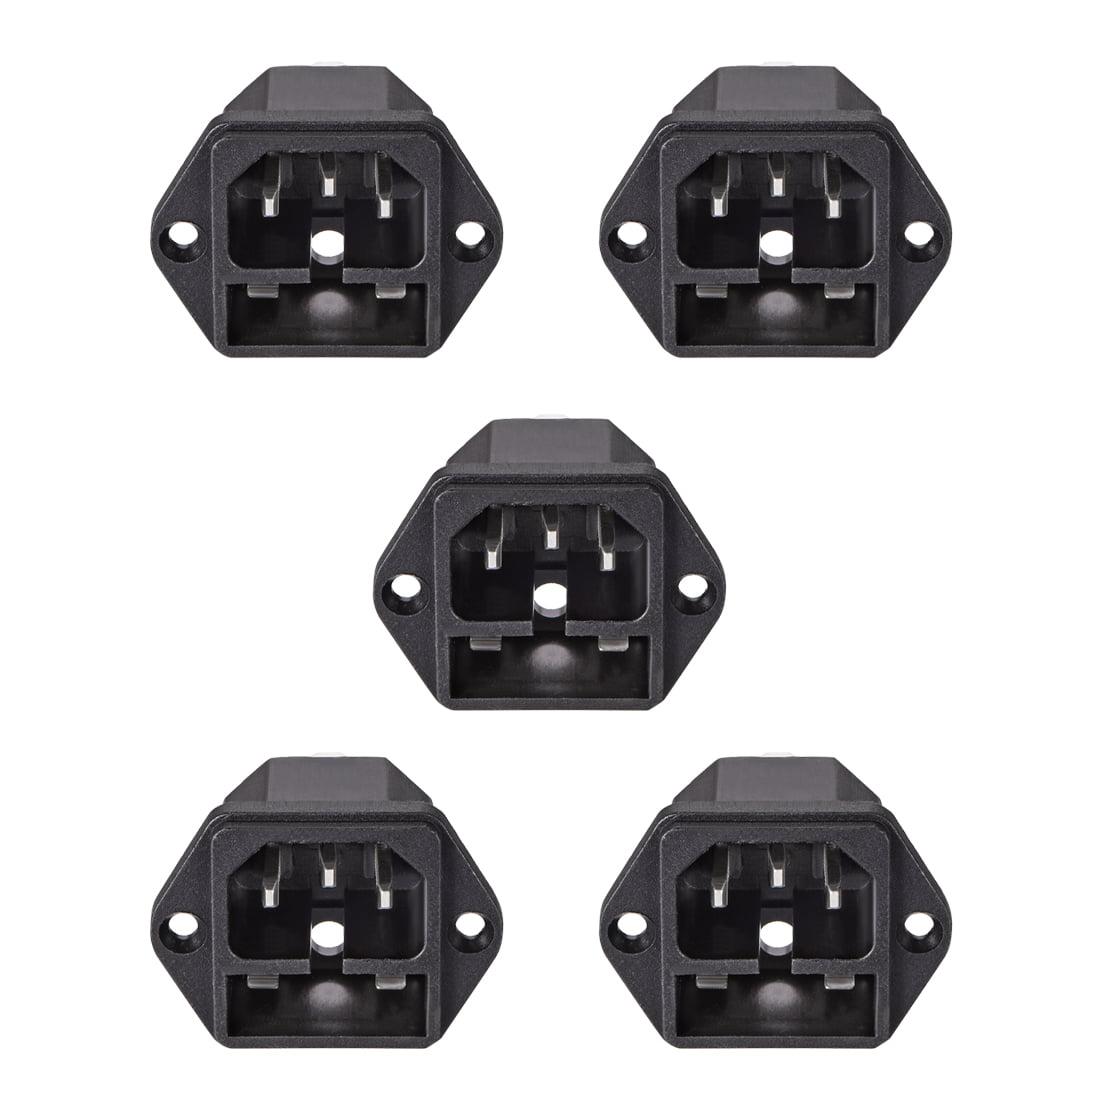 C14 Panel Mount Plug Adapter AC 250V 10A 3Pins IEC Inlet Module Plug Socket 5pcs - image 3 of 3